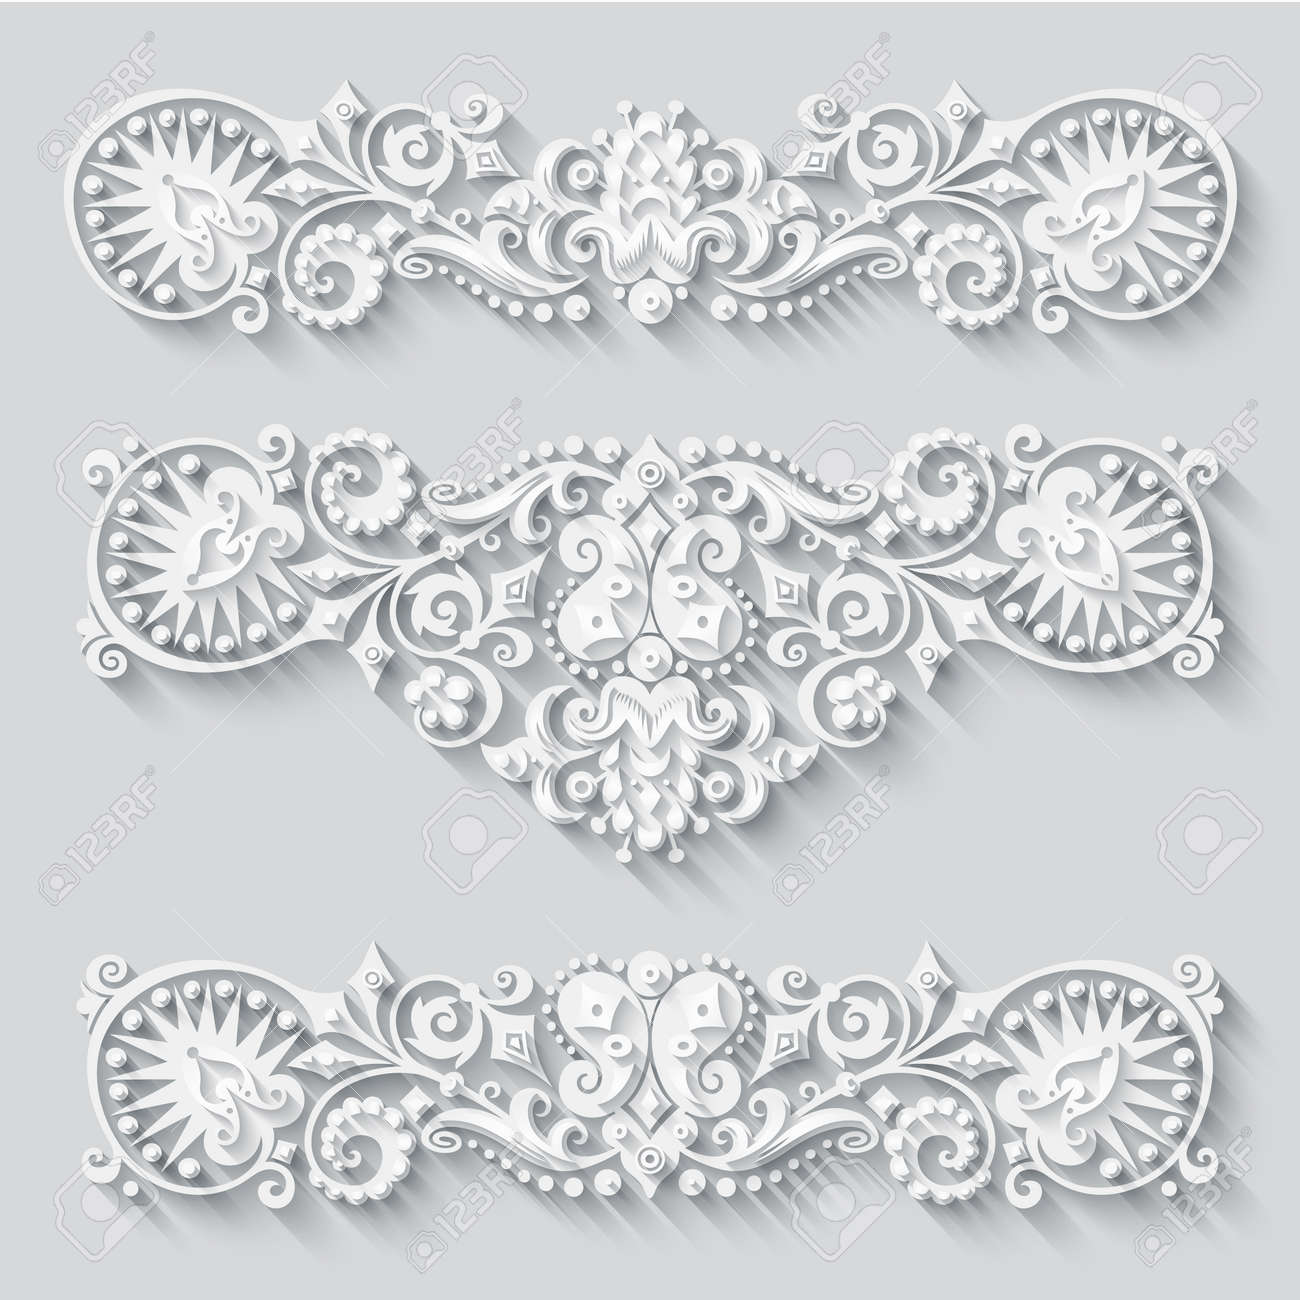 Vector modern volumetric floral elements - 151982731